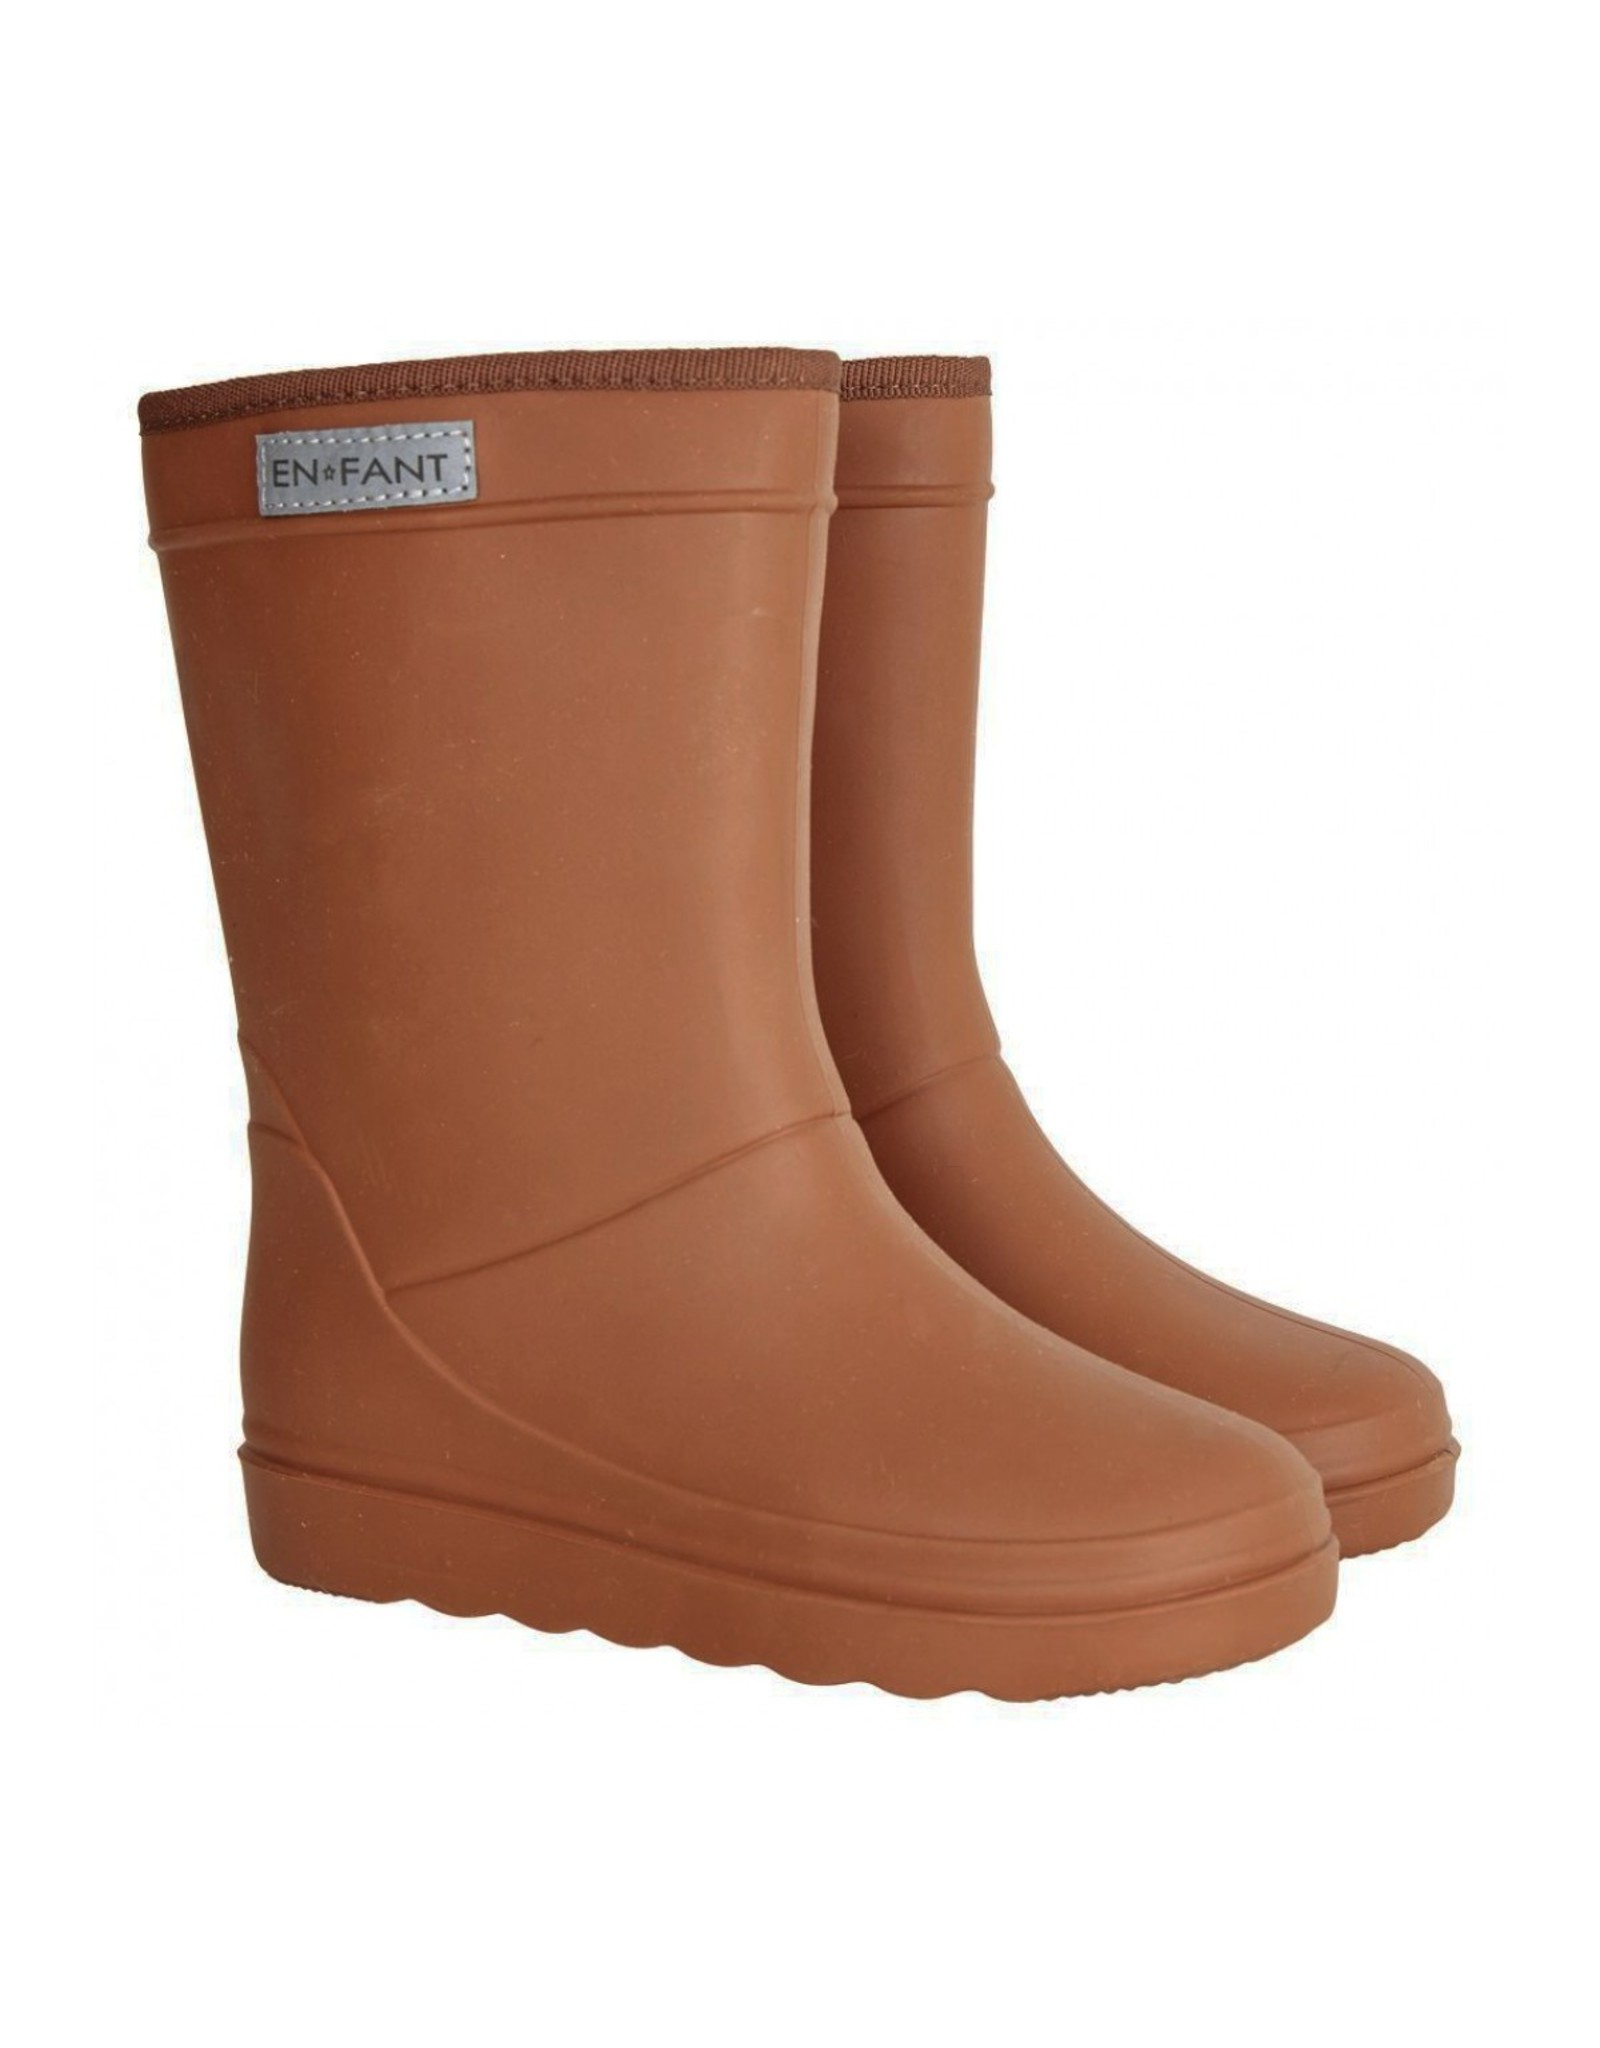 EN FANT En FANT Thermo Boots Camel